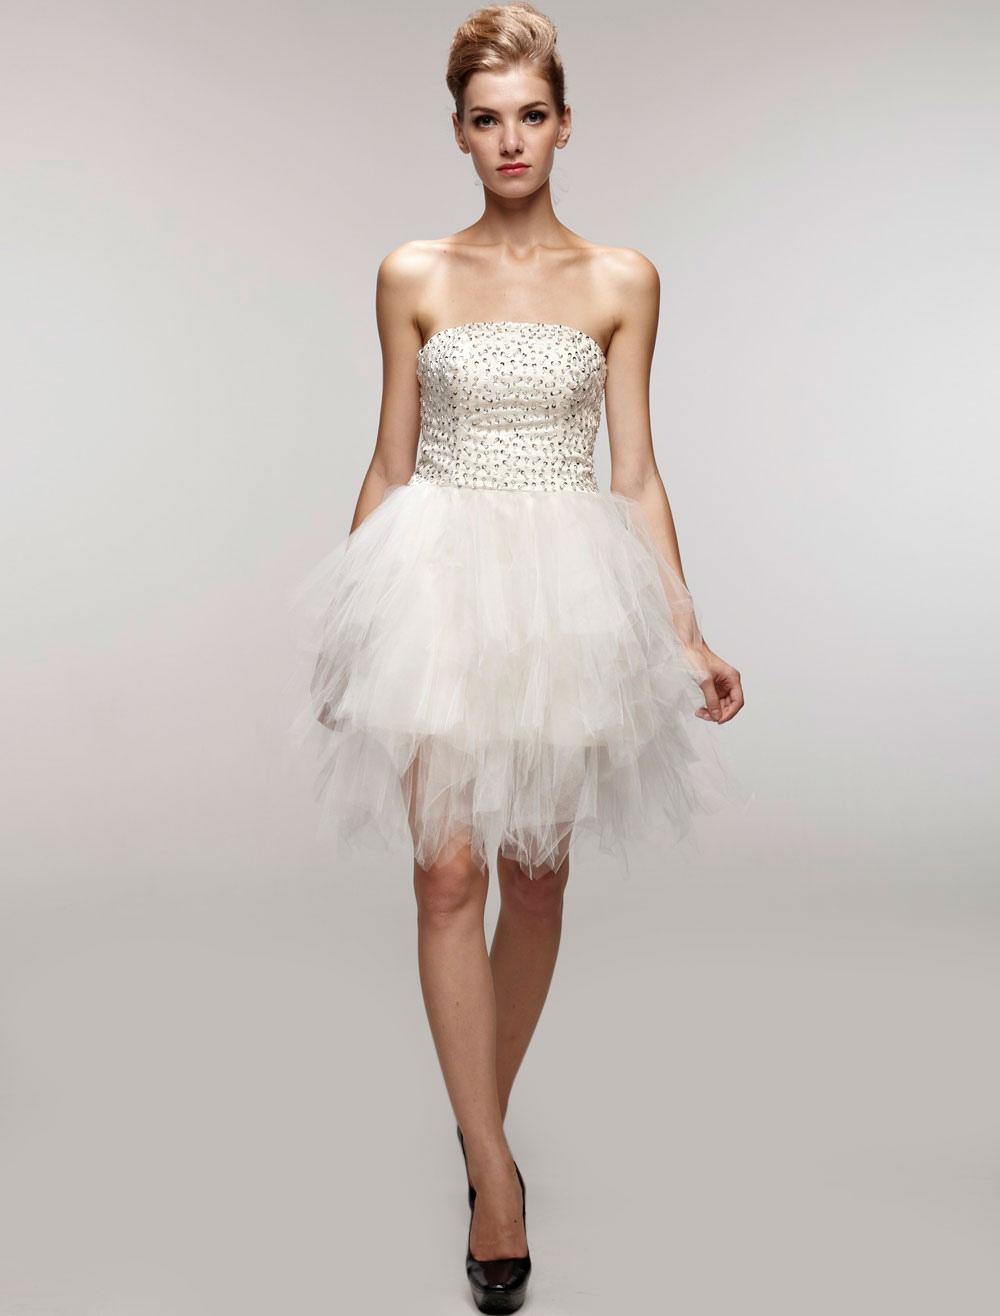 Magnificent White Gauze Strapless Beaded Mini Wedding Dress (Cheap Party Dress) photo